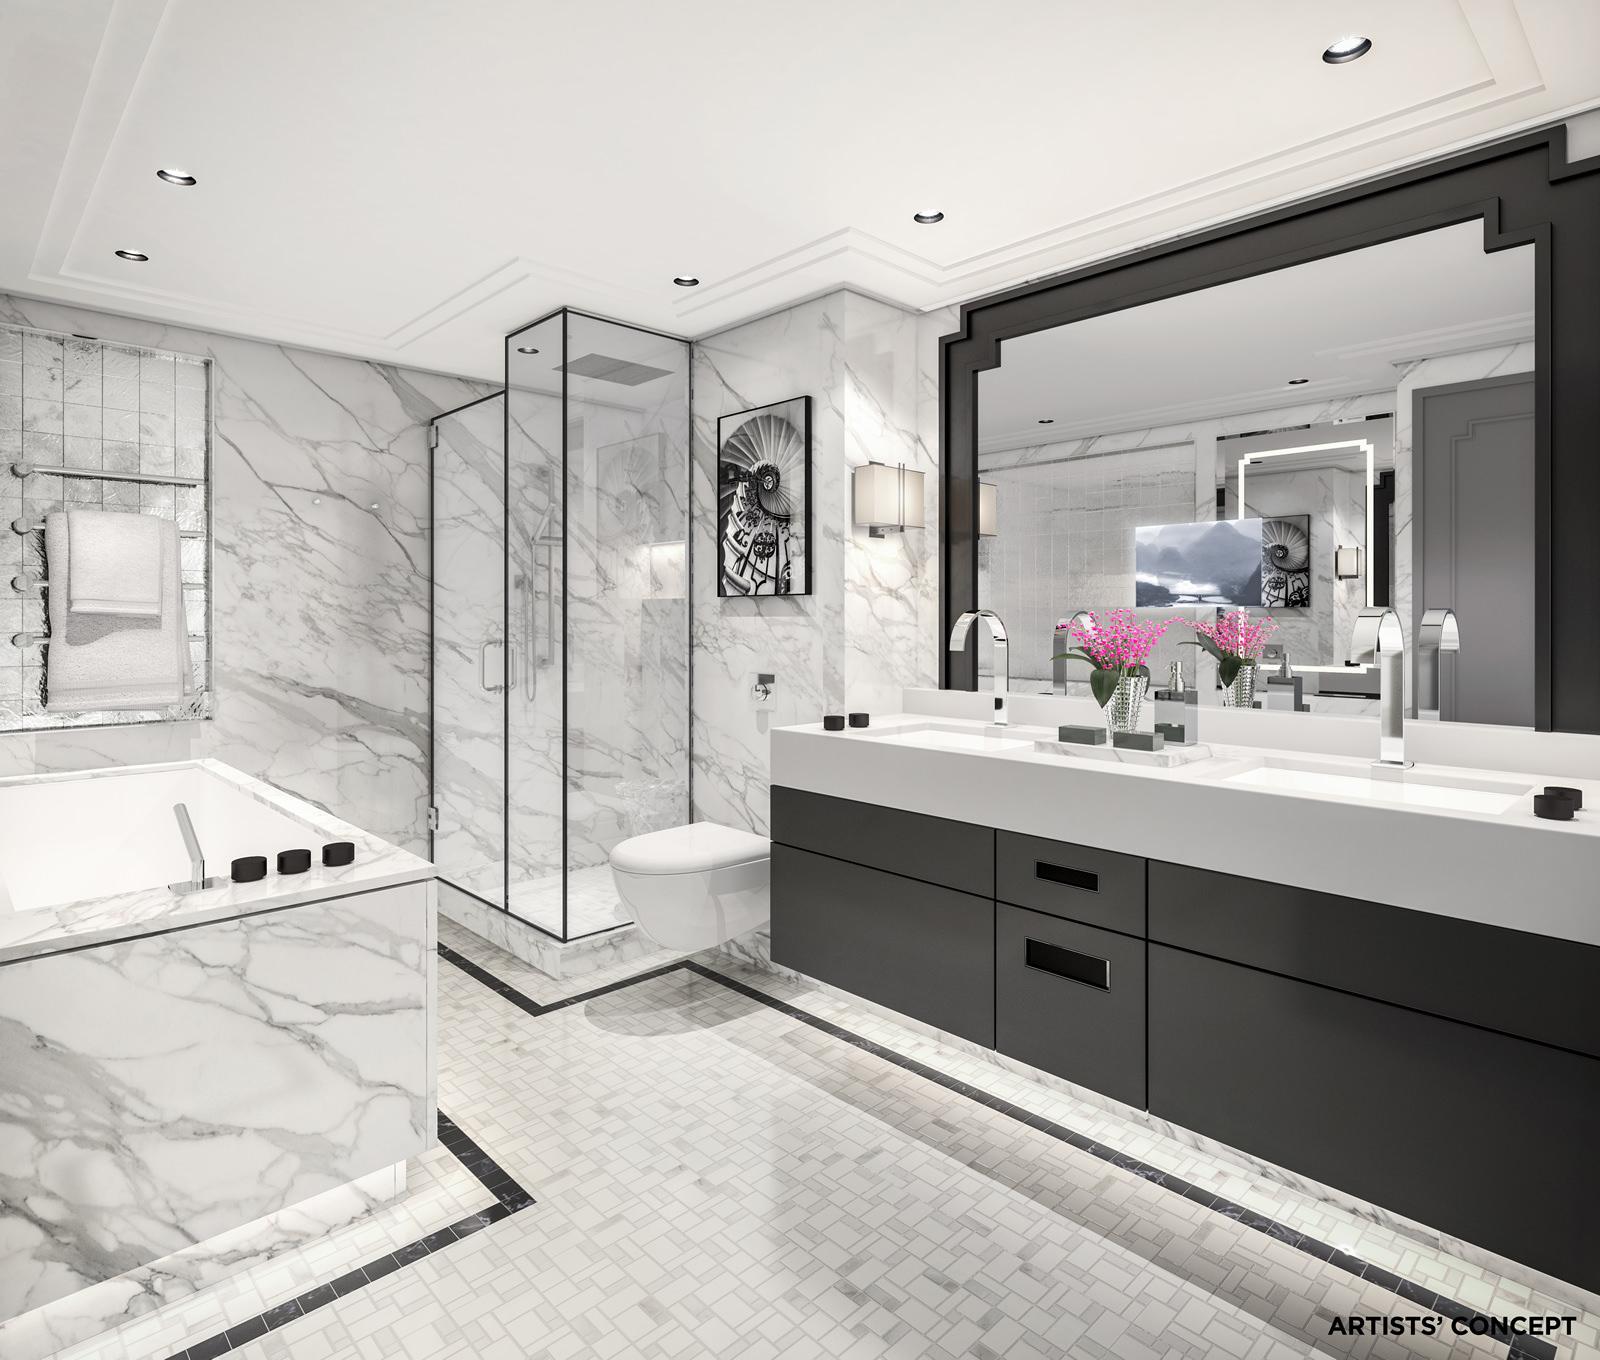 Crystal Mozart suite bathroom rendering. Courtesy of Crystal Cruises